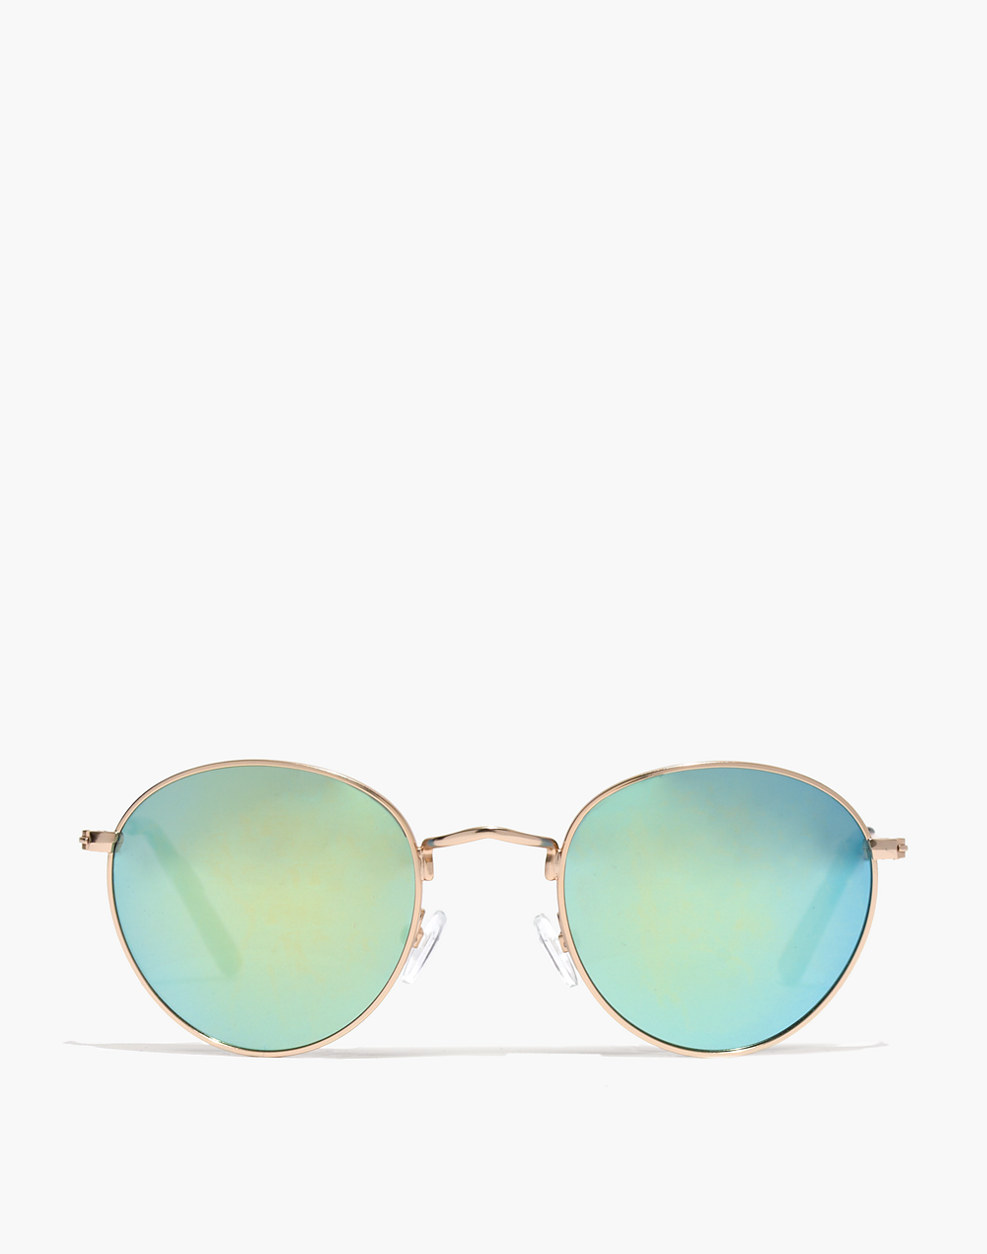 sunglasses aviator  Fest Aviator Sunglasses : beach accessories